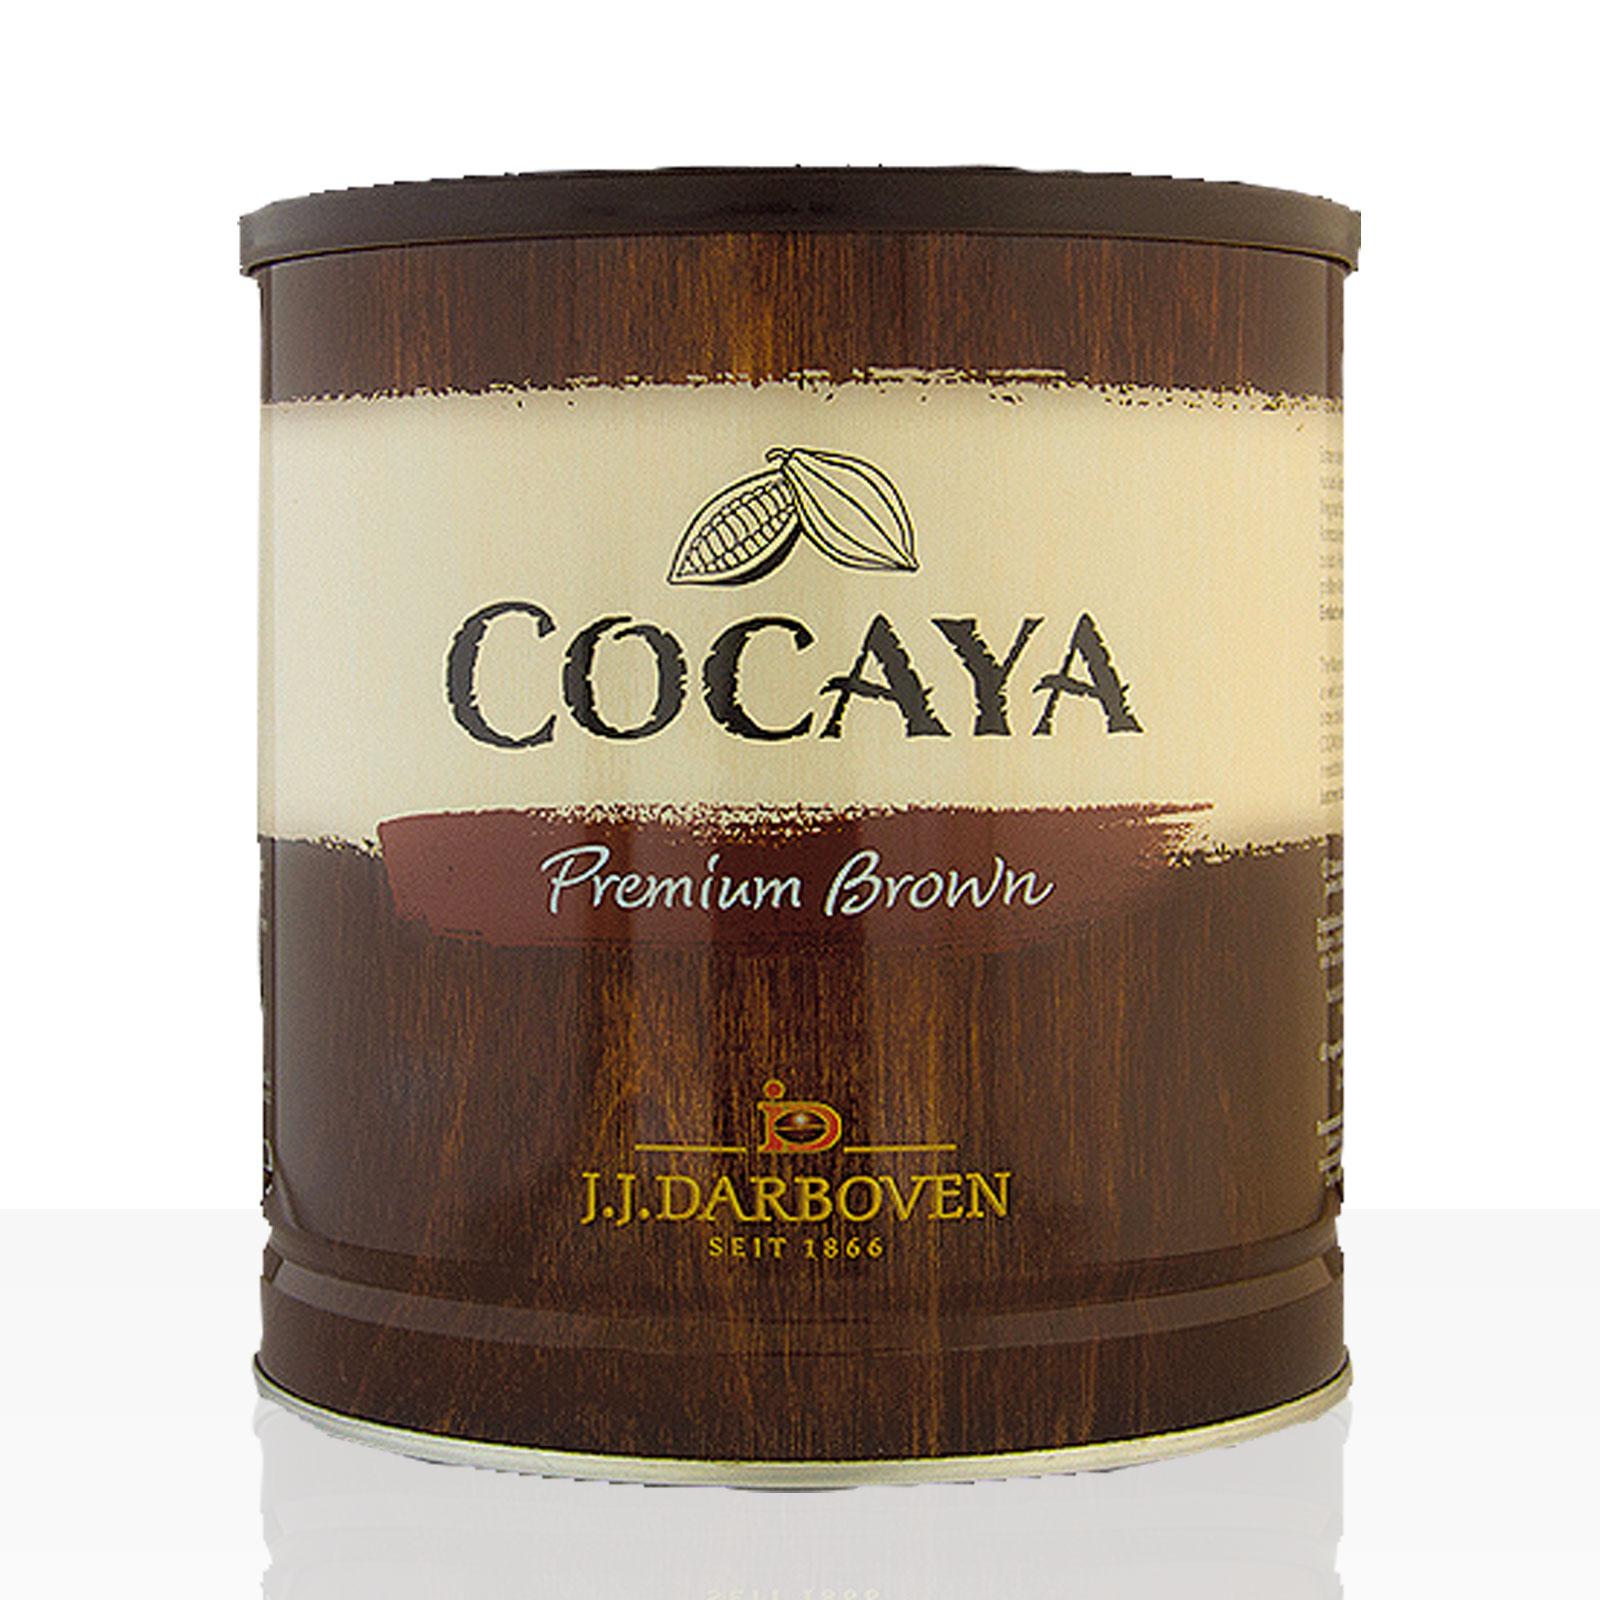 Darboven Cocaya Premium Brown 4 x 1,5kg Dose Kakao Trinkschokolade